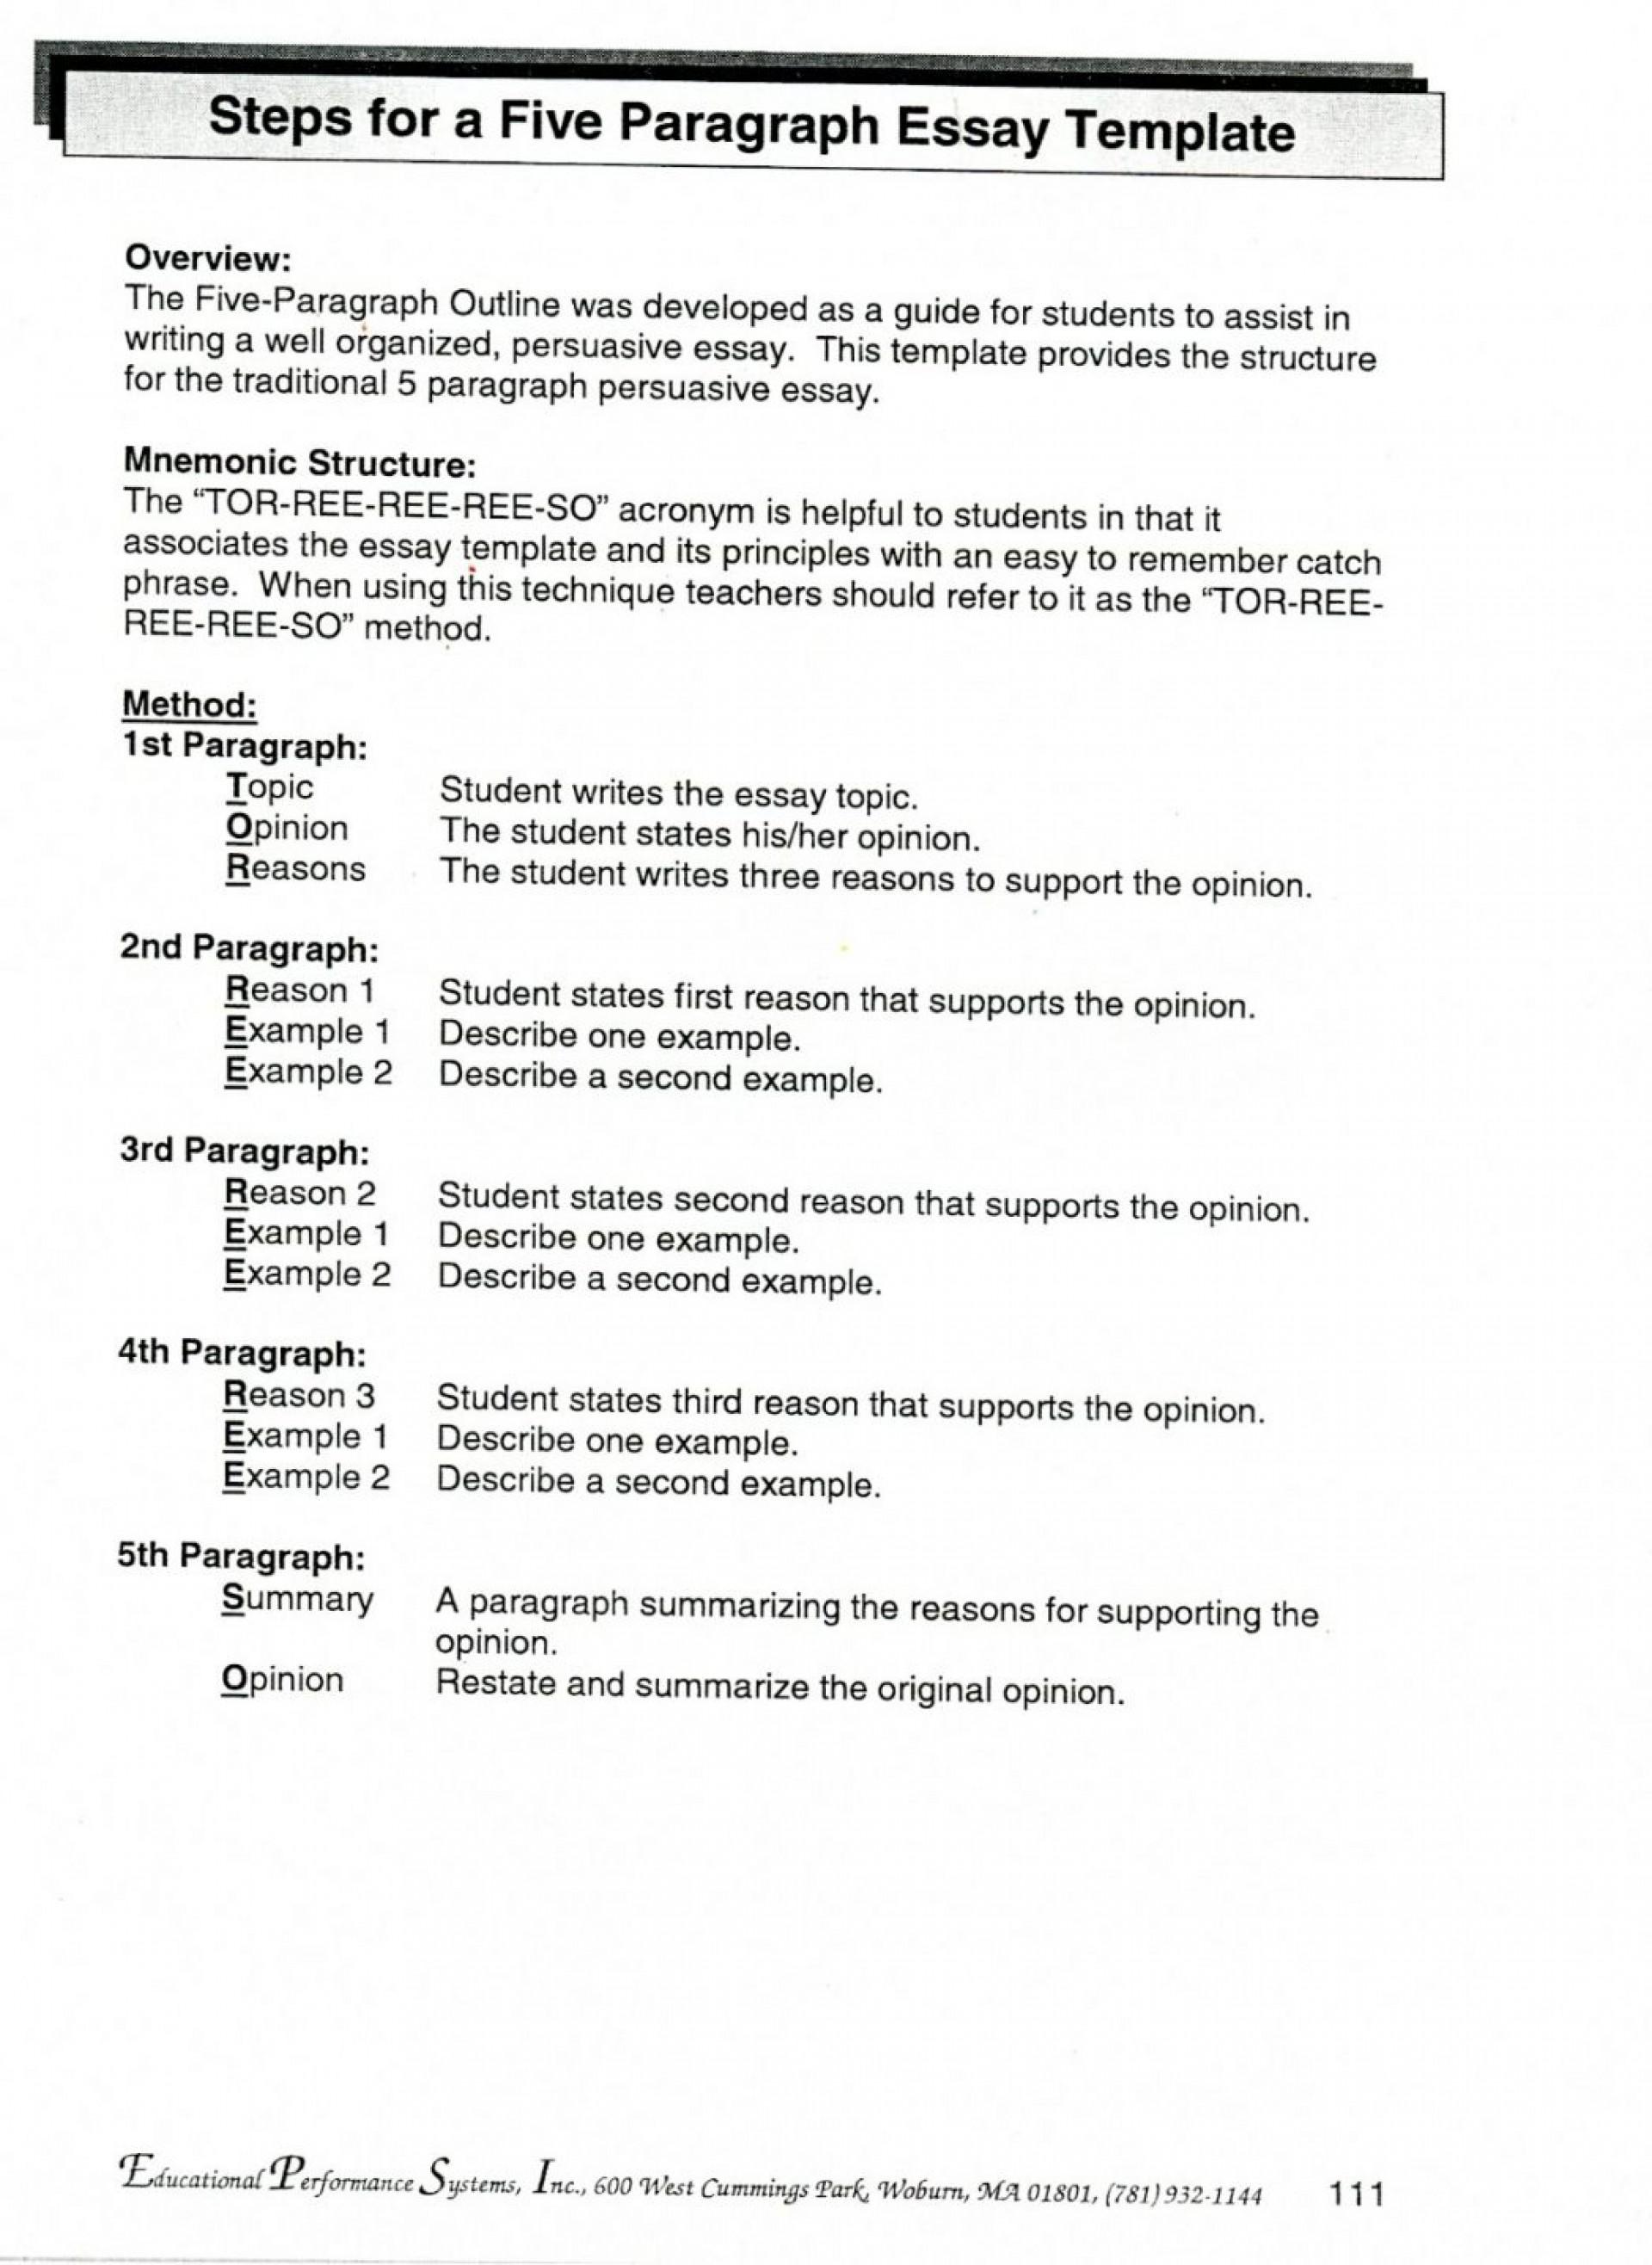 017 Persuade Essay Writing Persuasive Argumentative Sample 5th Grade Exa Dareles Informative Samples Pdf Descriptive Expository Opinion 1048x1437 For Impressive Essays Written By Fifth Graders A 1920